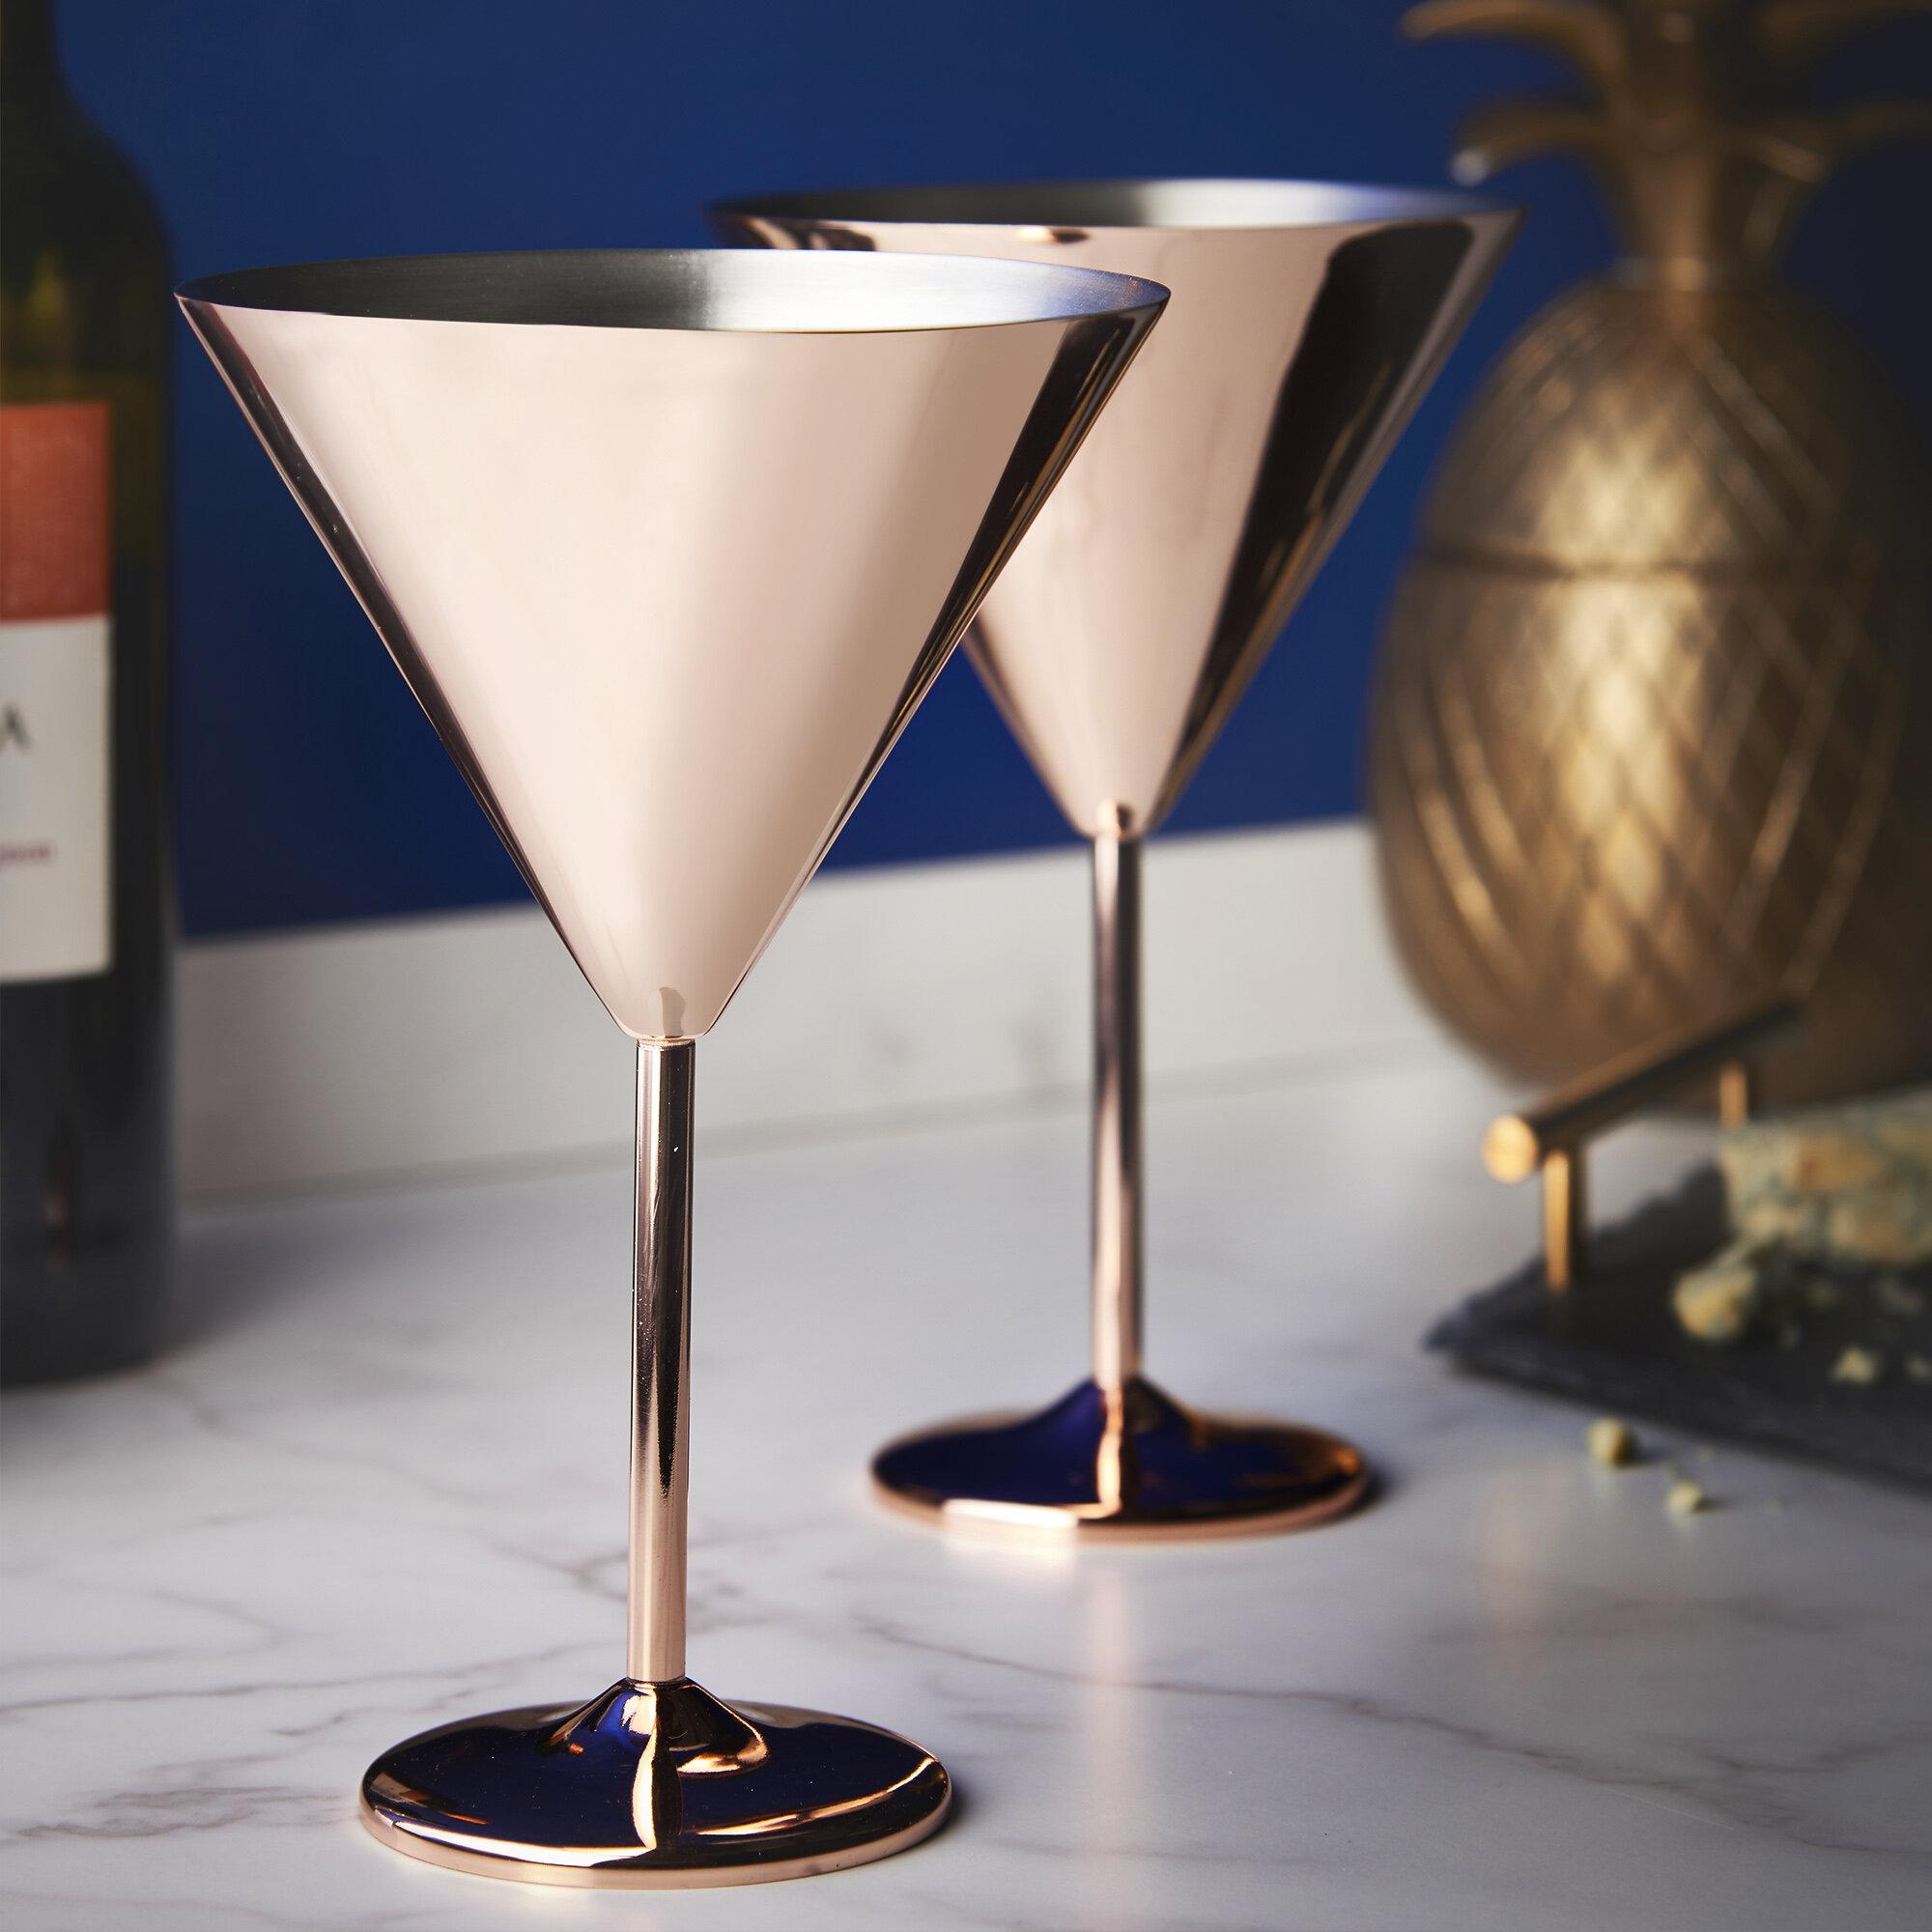 Vonshef 16 Oz Stainless Steel Martini Glass Wayfair